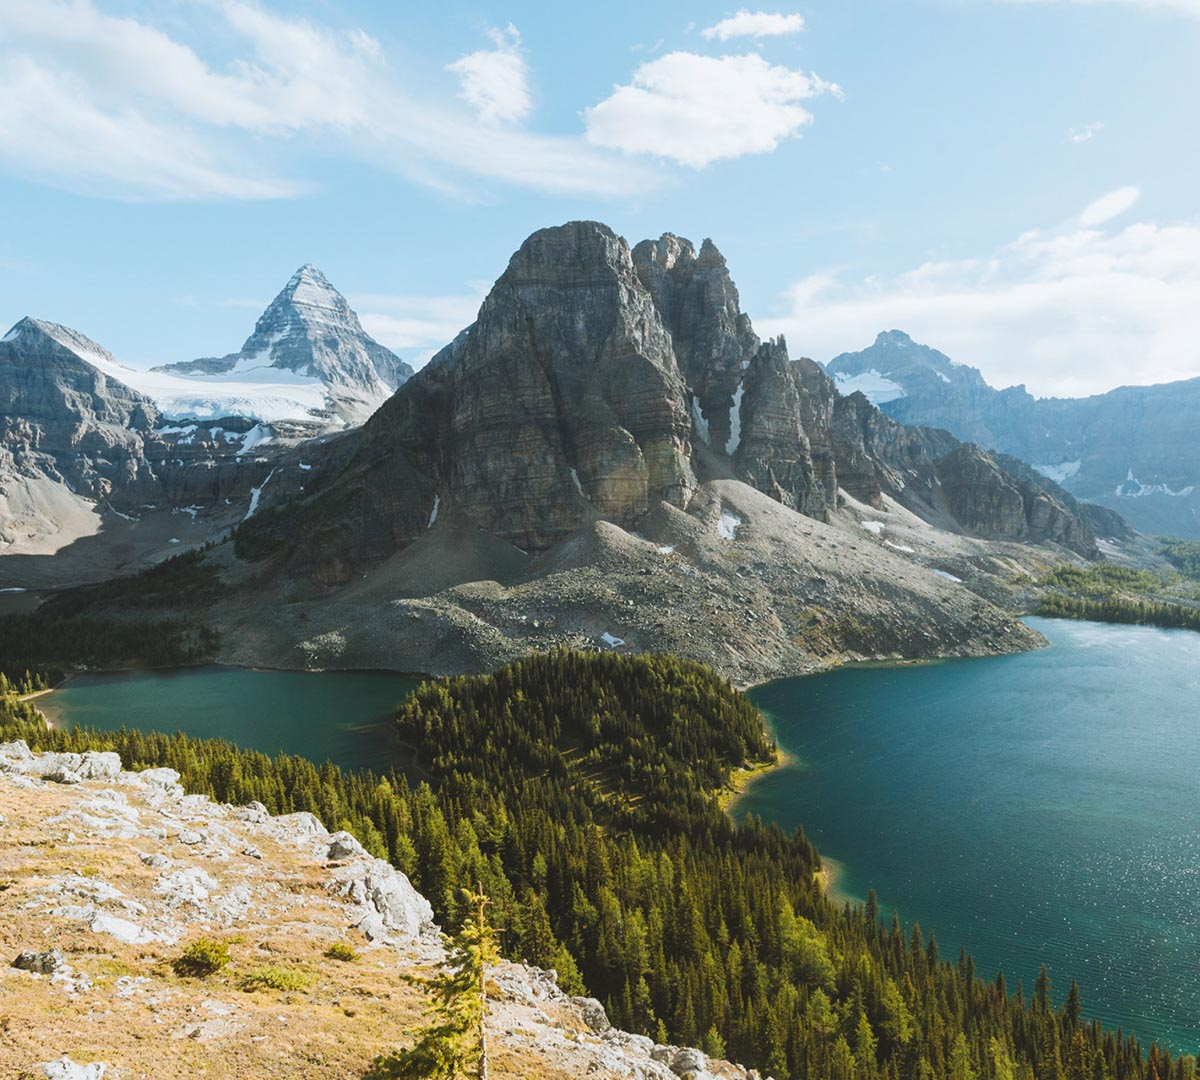 mont assiniboine mountain with lakes